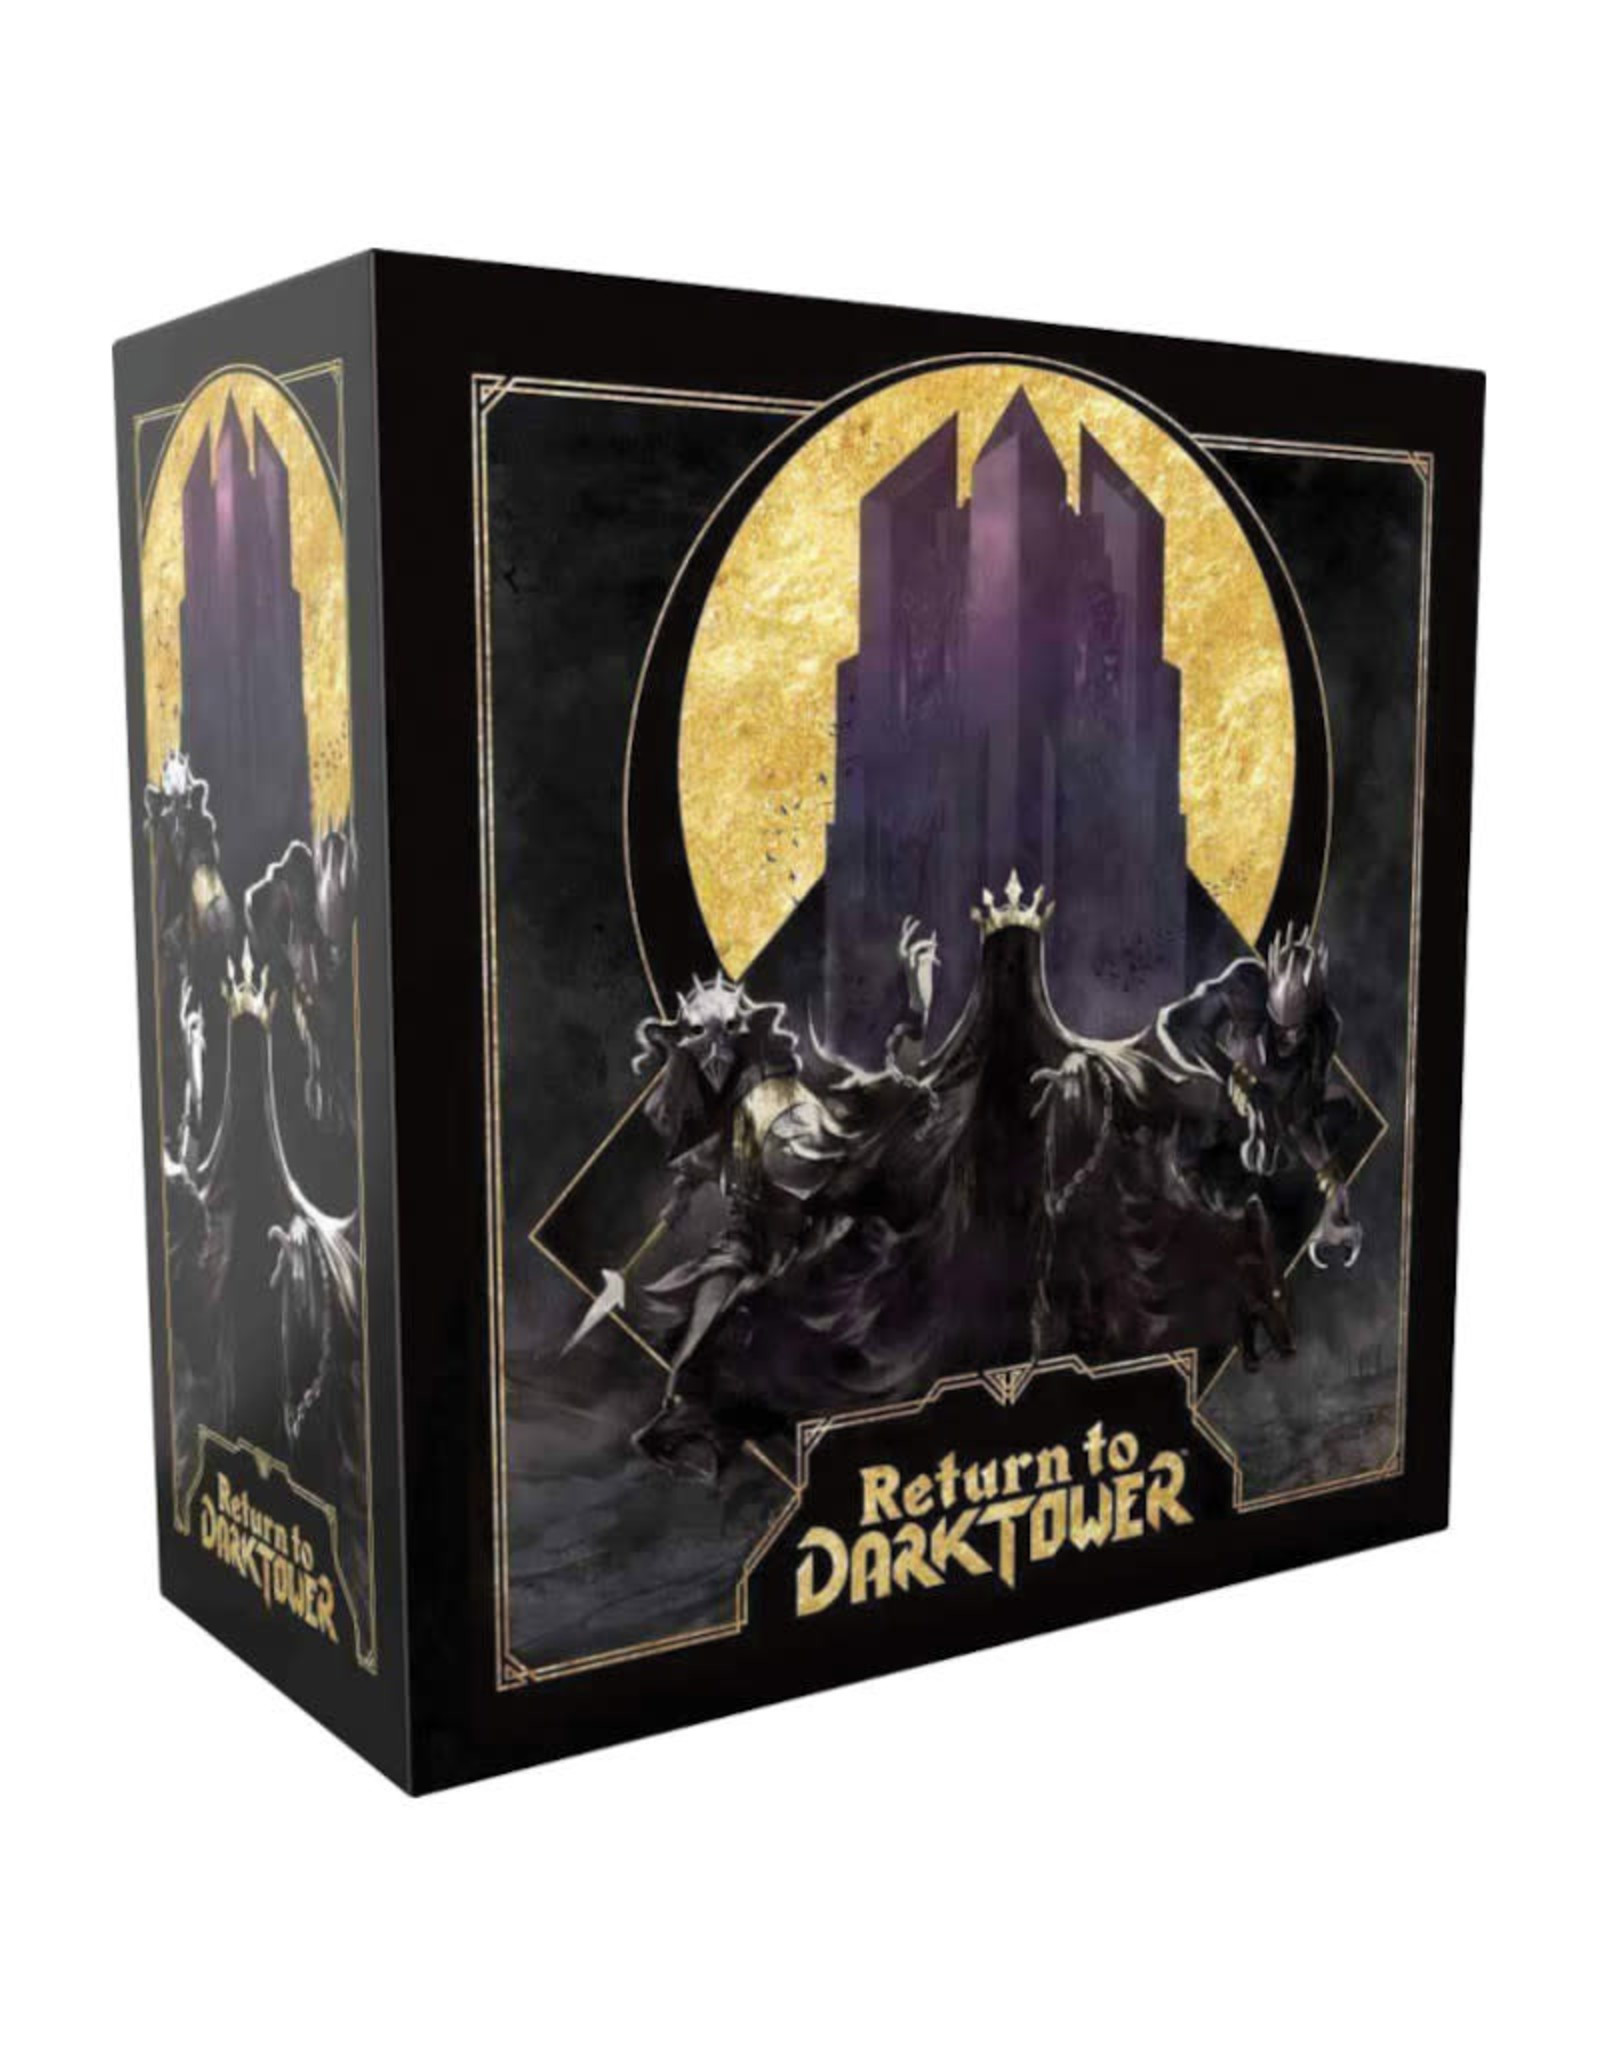 Restoration Games (November 2021 - January 2022) Return to Dark Tower